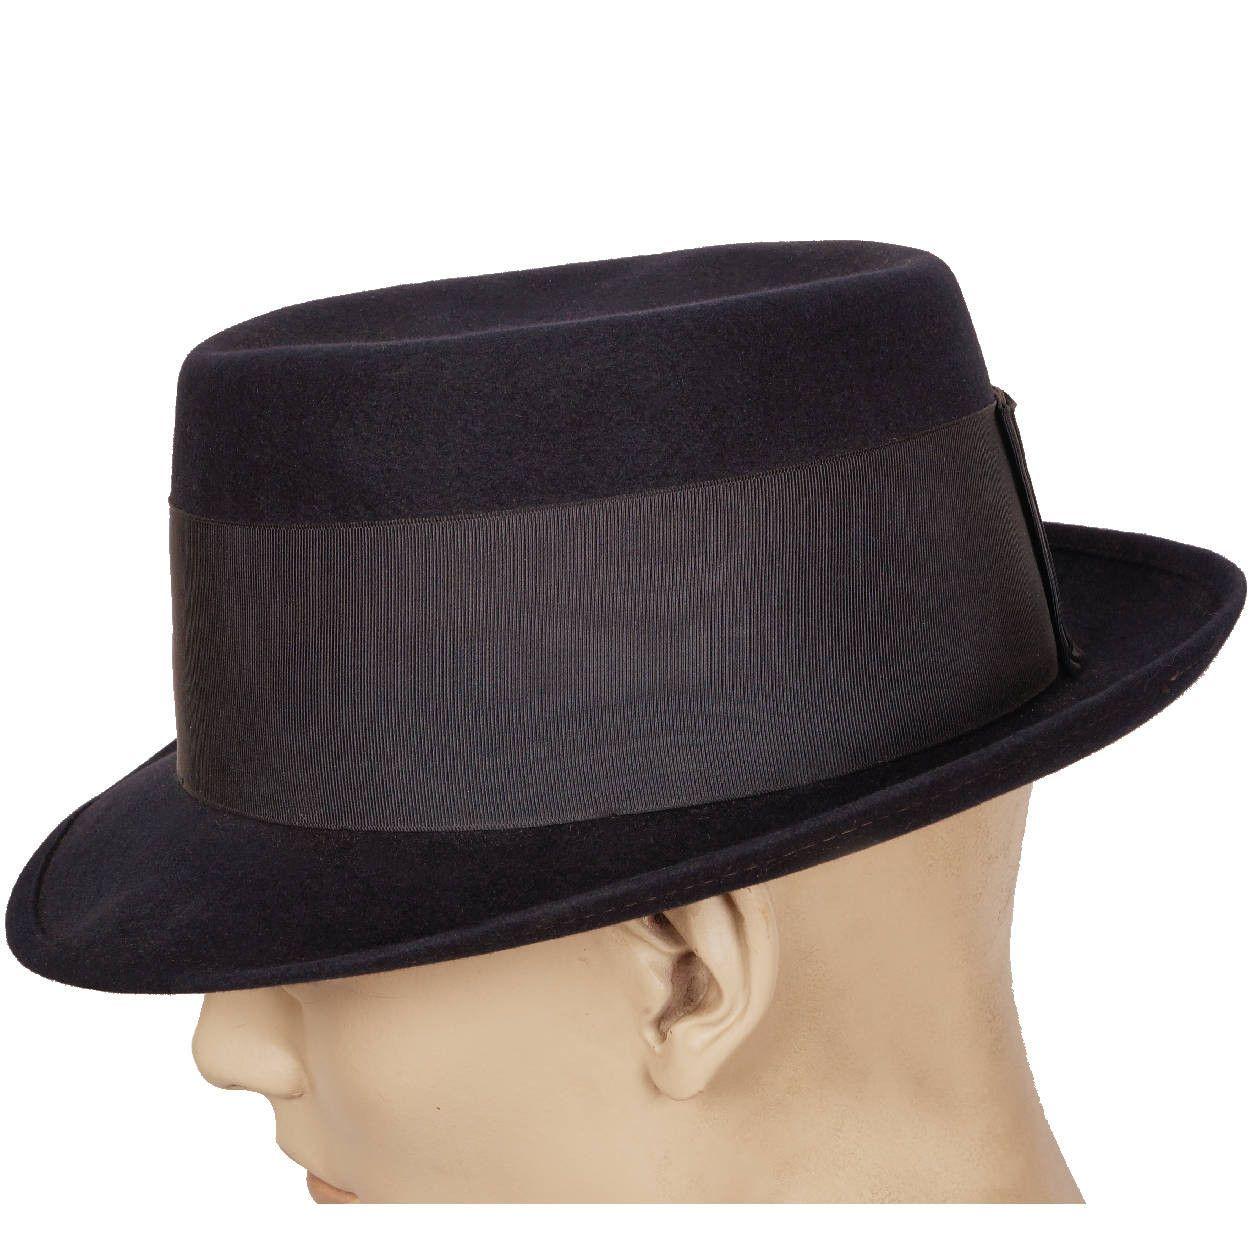 Vintage Royal Stetson Pork Pie Hat Navy Blue Flat Top Fedora Style Size 7 1  3d84802dd86